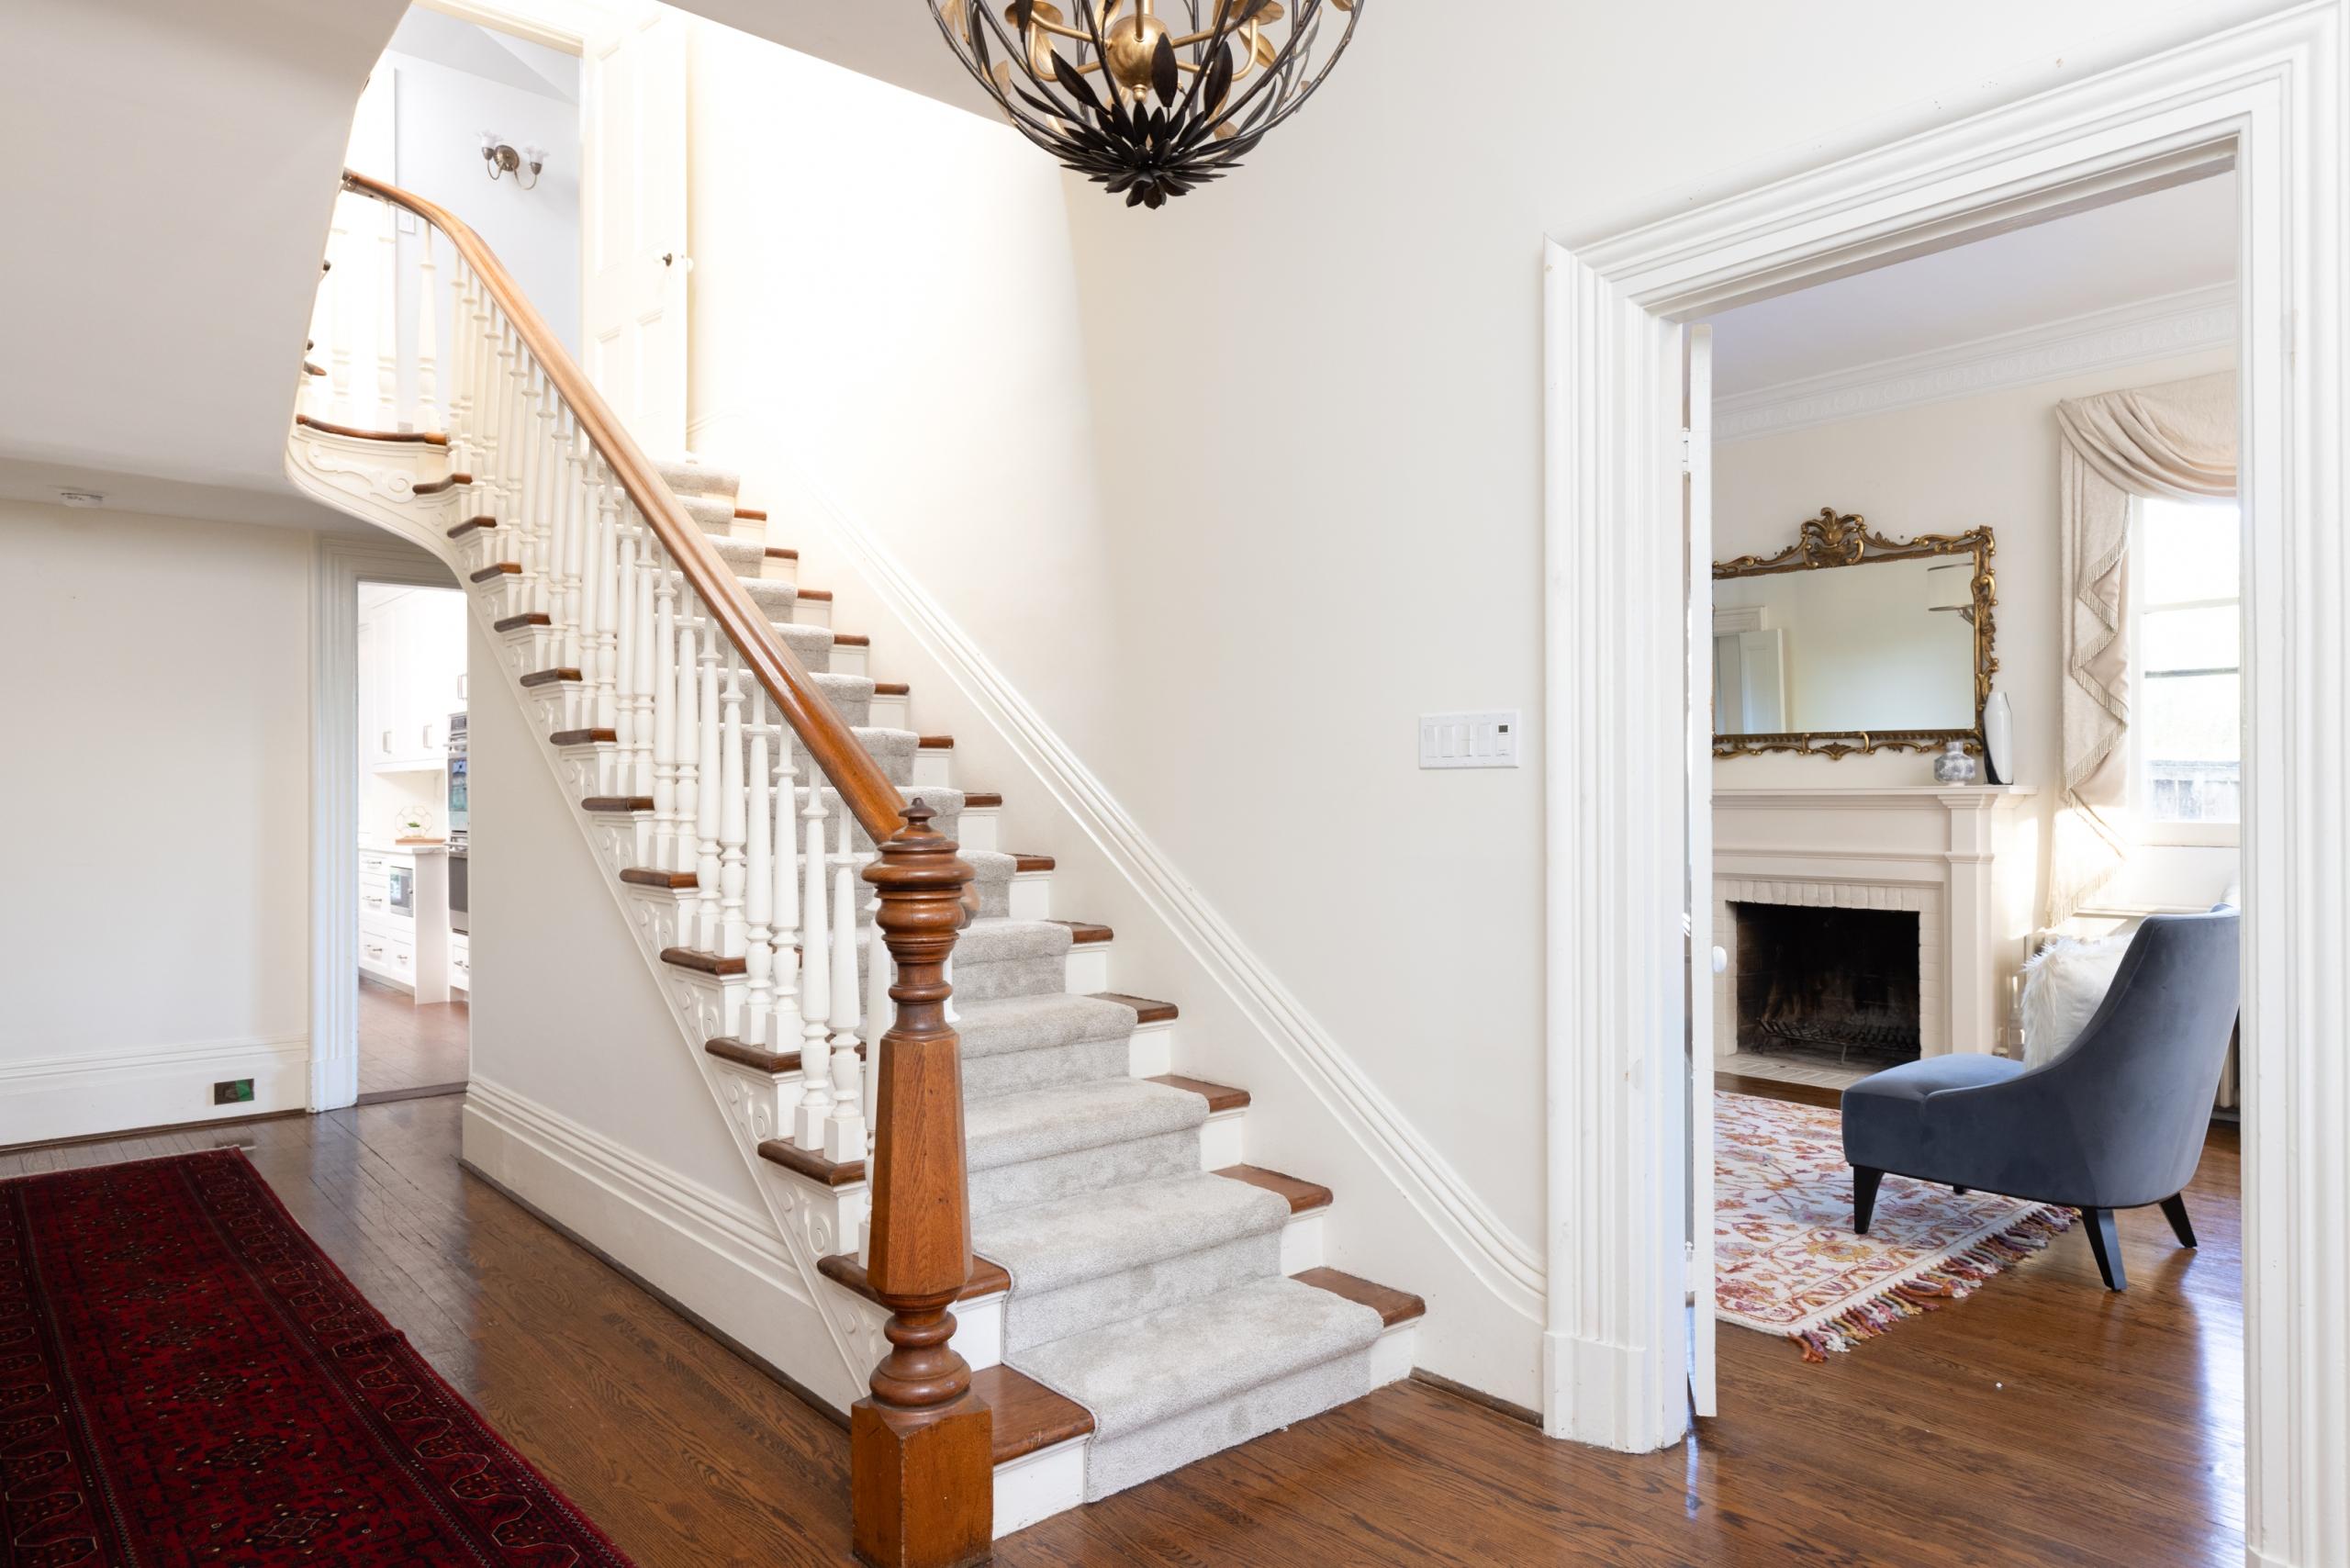 Living room featured at 349 Trafalgar Road, Old Oakville, ON at Alex Irish & Associates